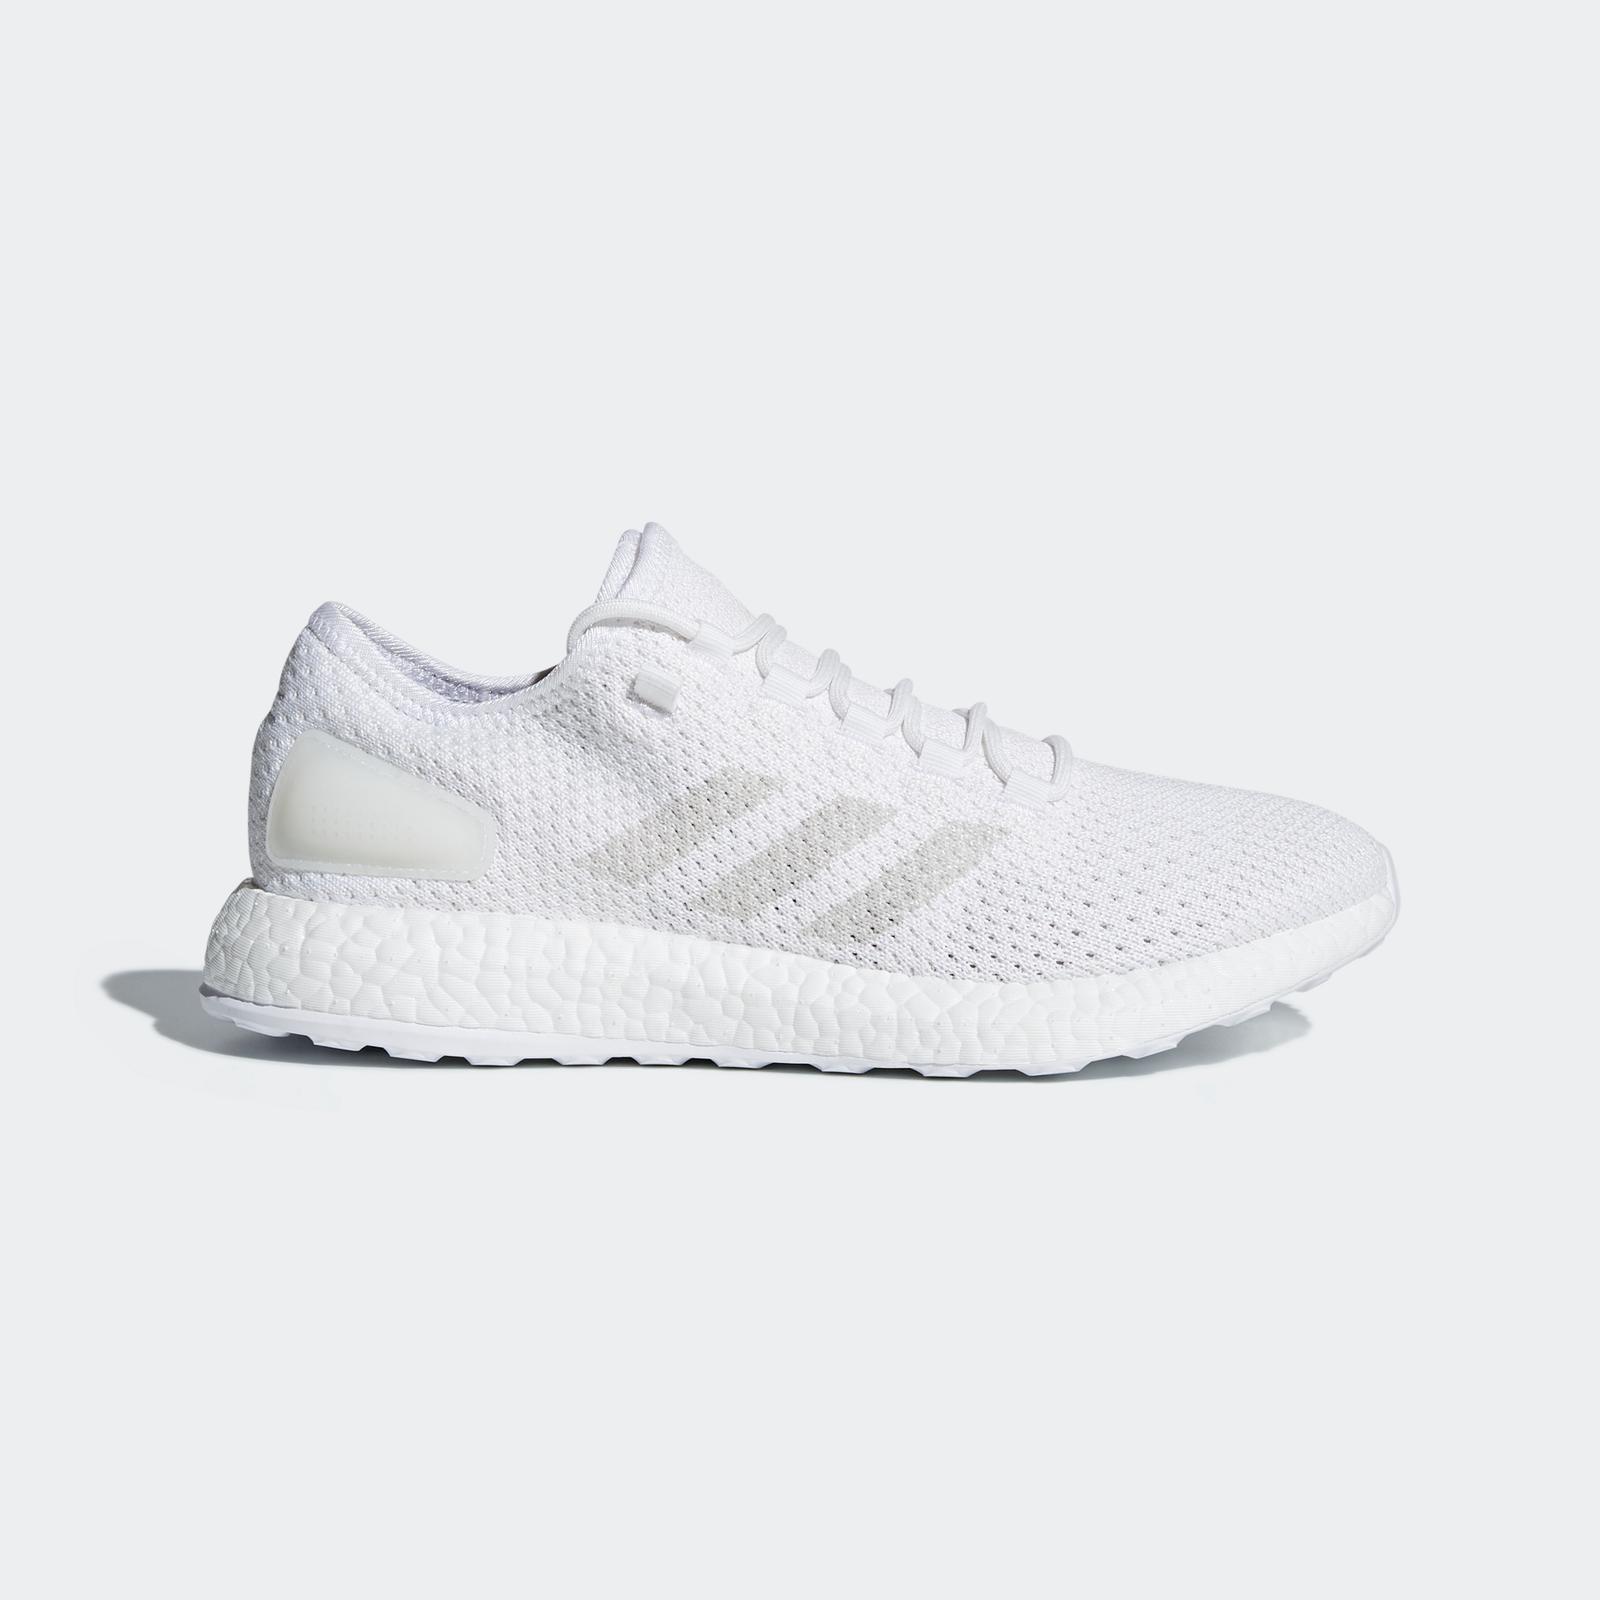 Adidas Pureboost Clima China [CM8236] Men Running Shoes White/Grey